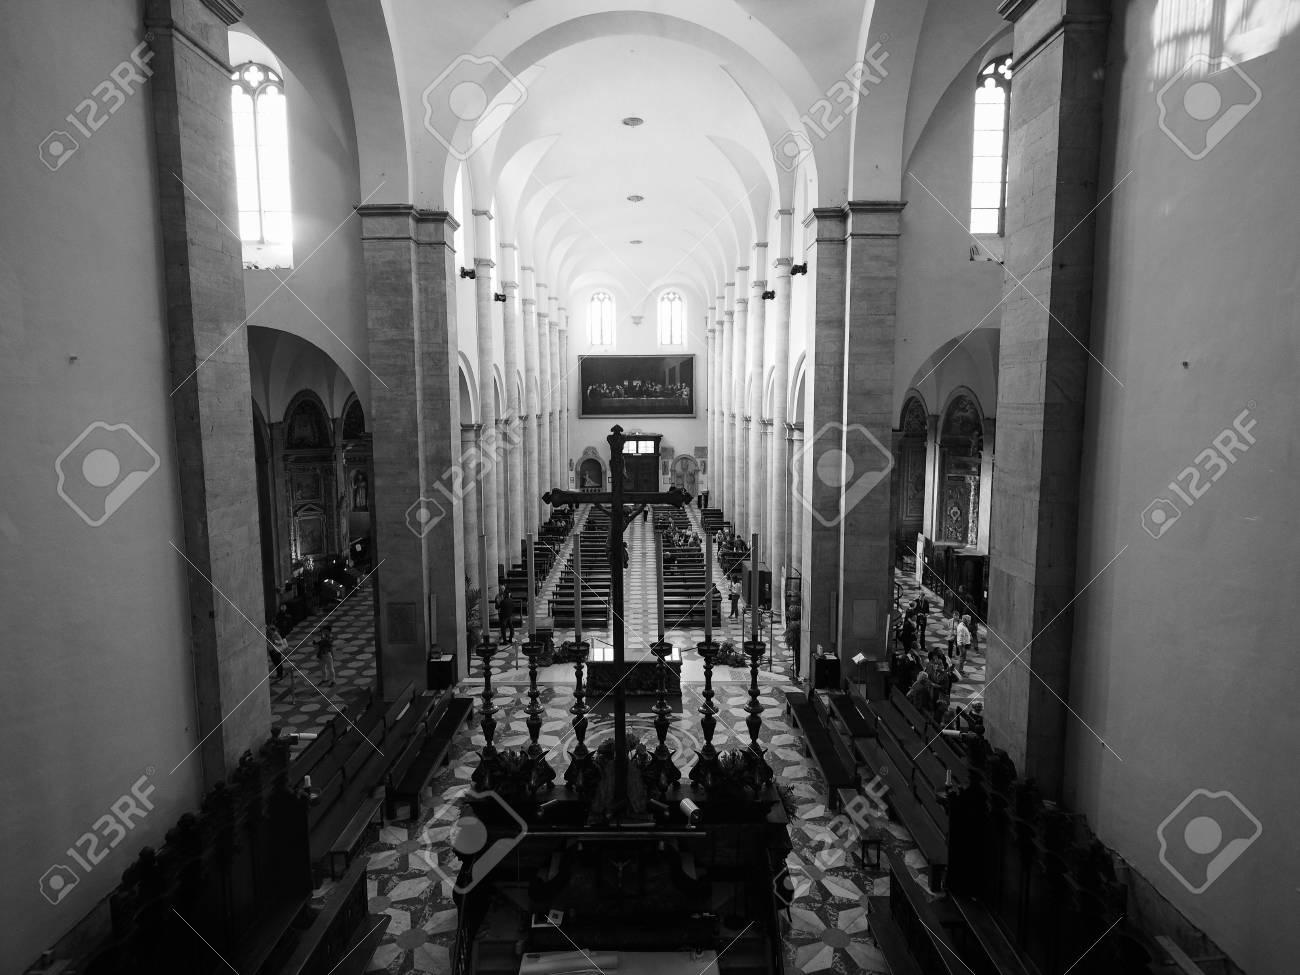 TURIN, ITALY - CIRCA OCTOBER 2018: Cappella della Sindone meaning